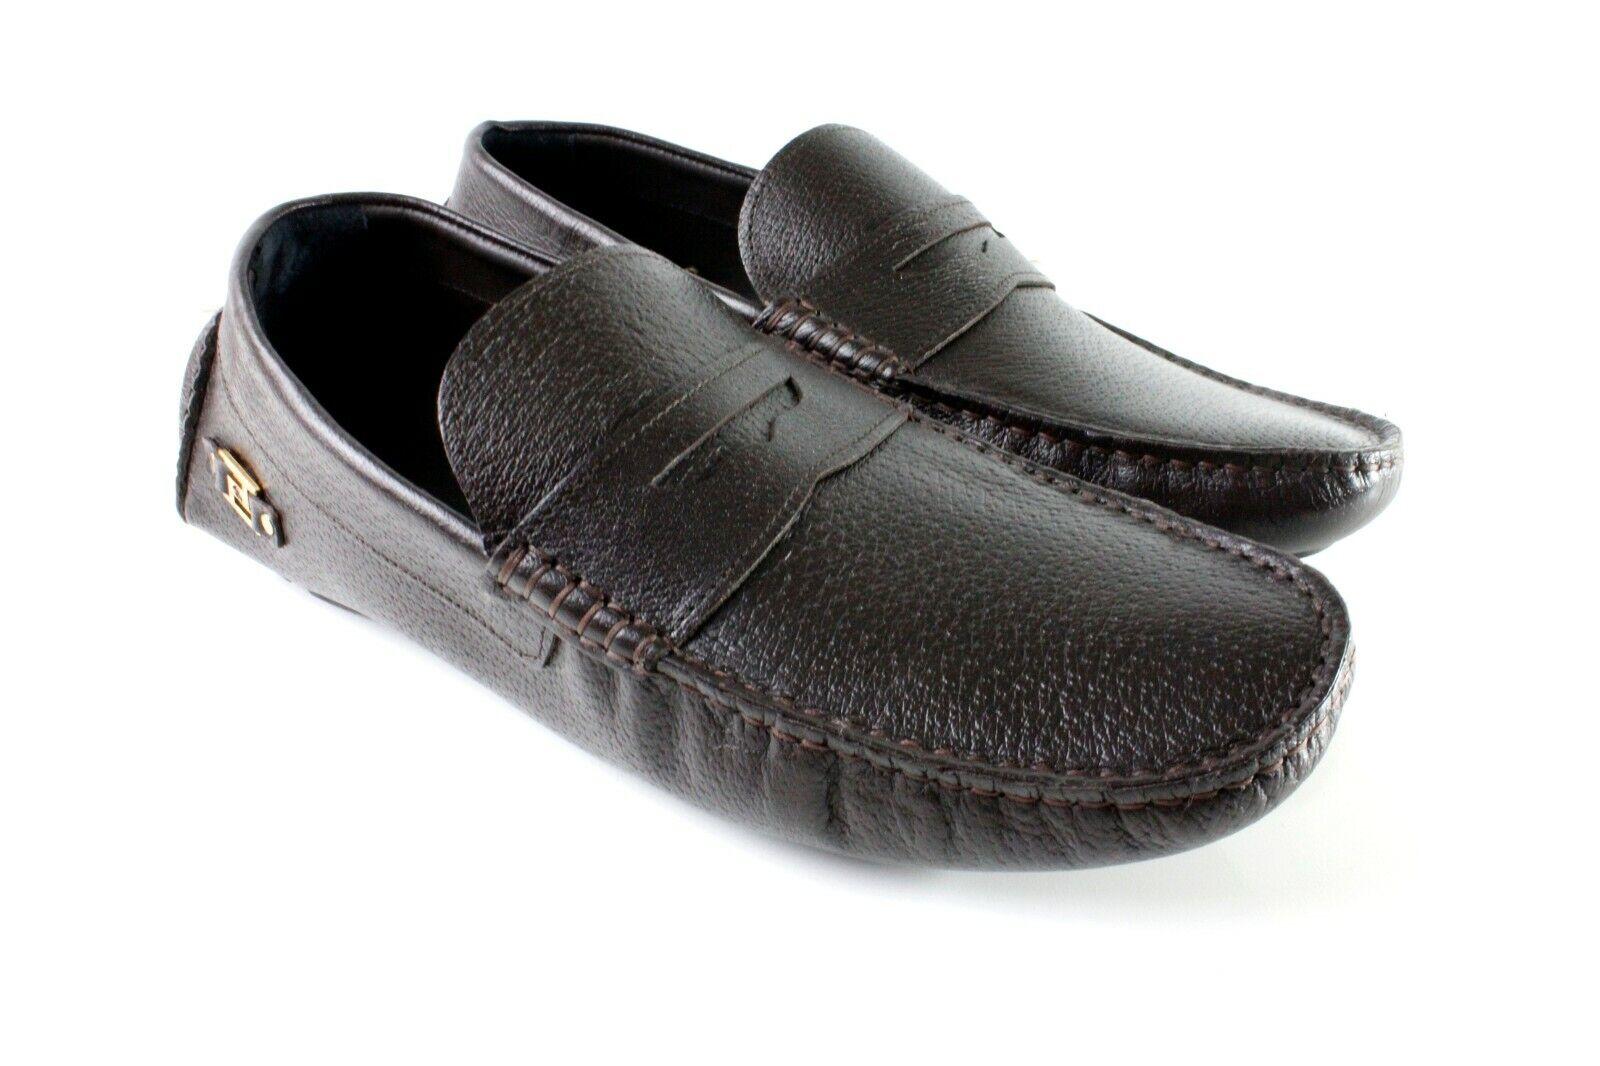 marron Handmade hommes en cuir Italien   Chaussures Chaussures de loisirs ITALIEN Mocassin 46